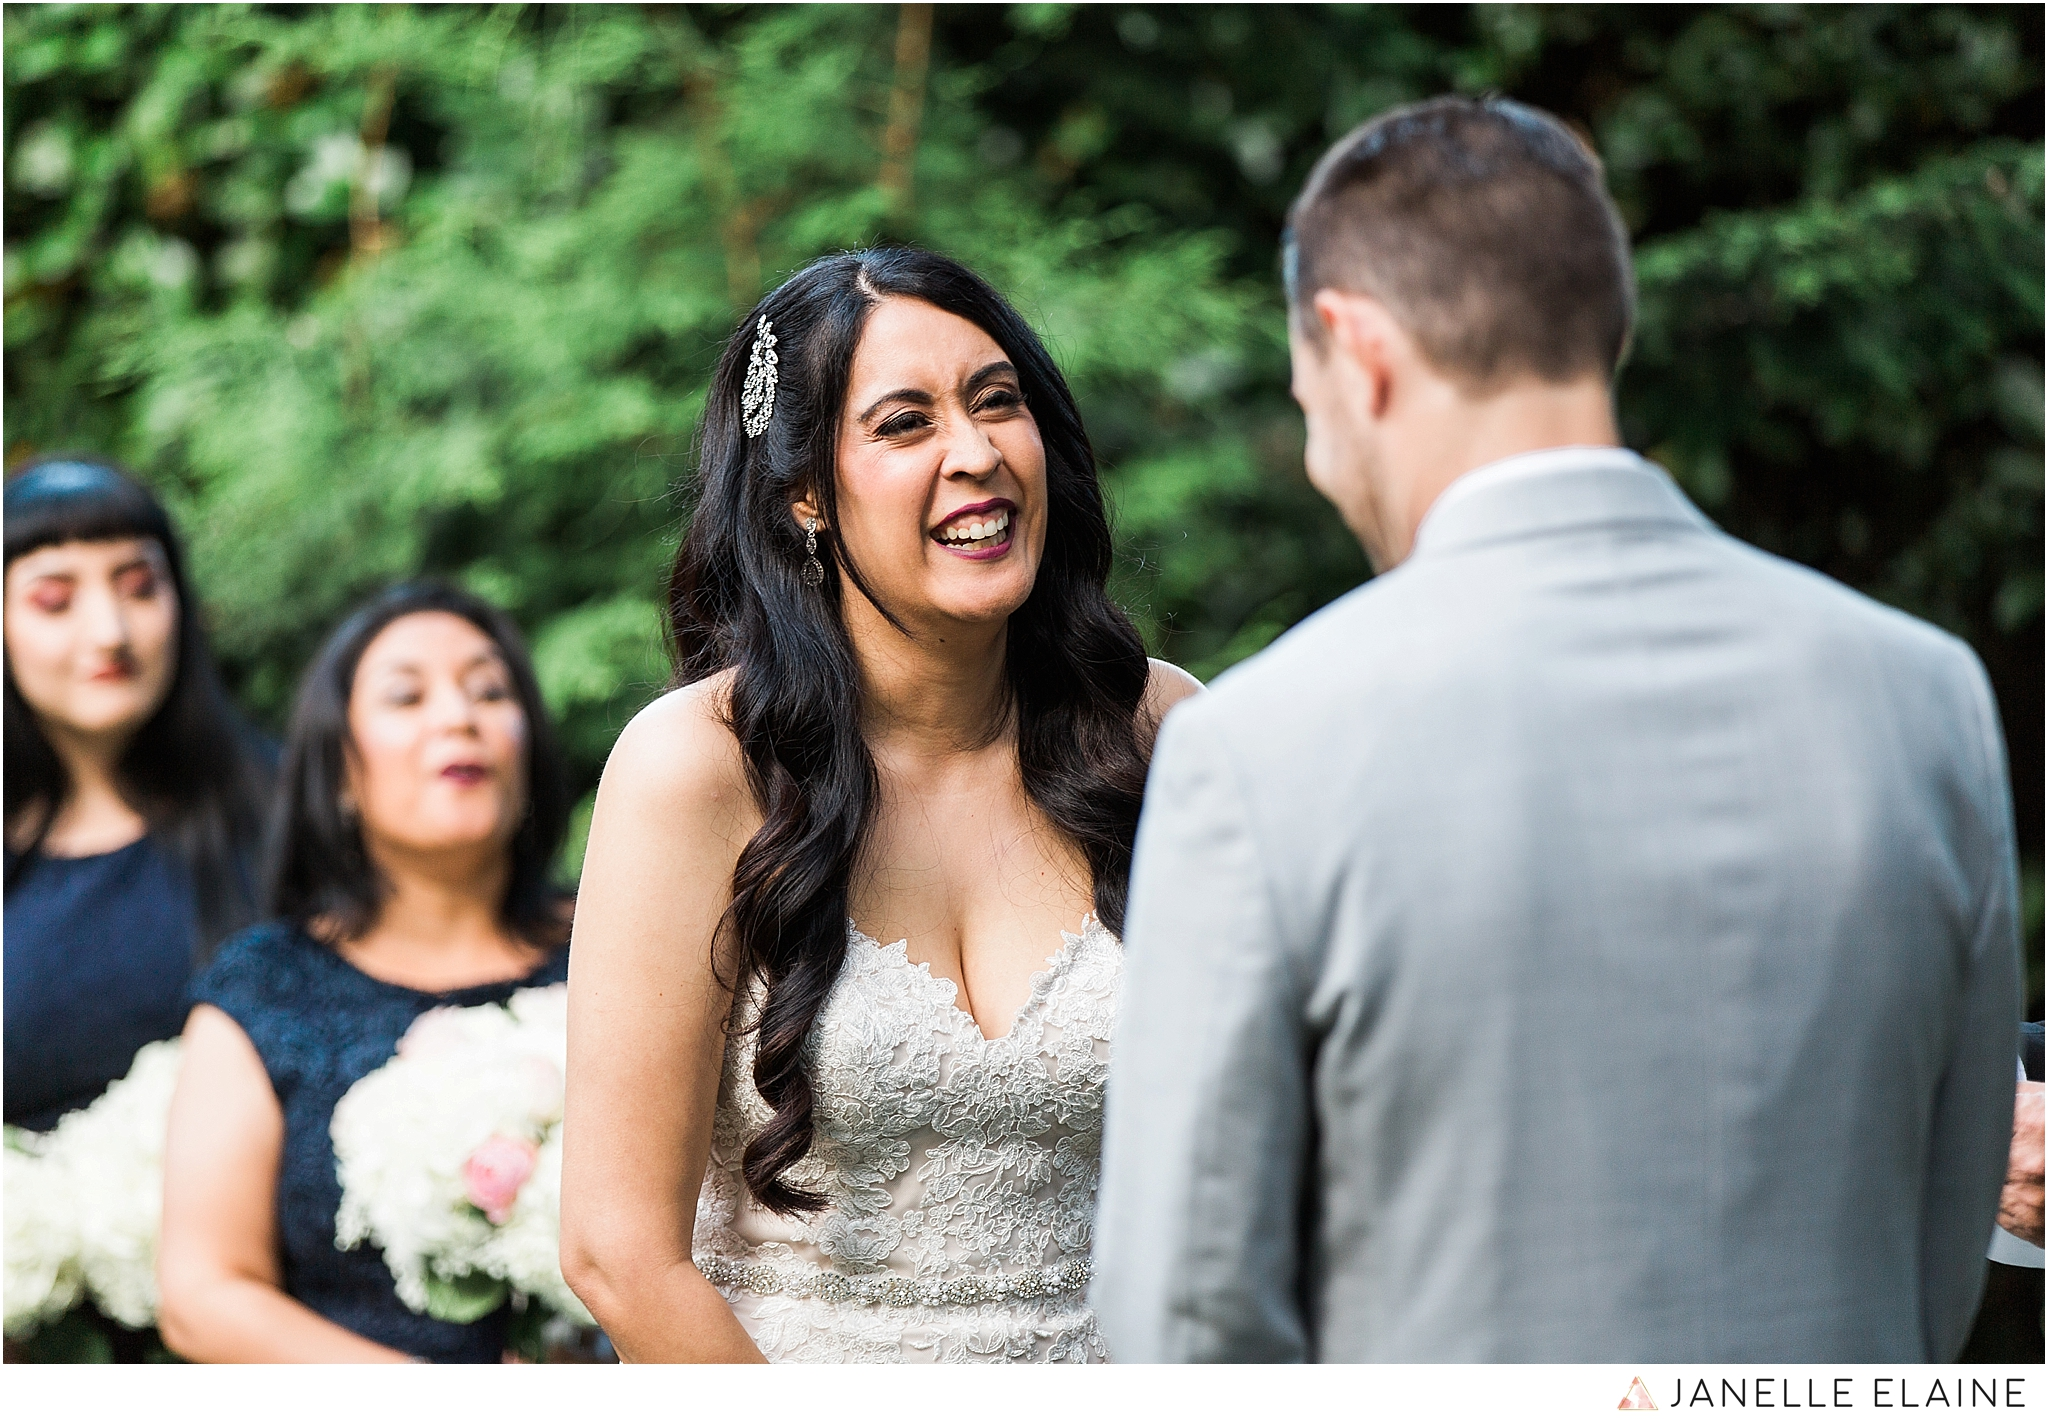 janelle elaine photography-professional wedding photographer-seattle-bellevue-robinswood house-147.jpg